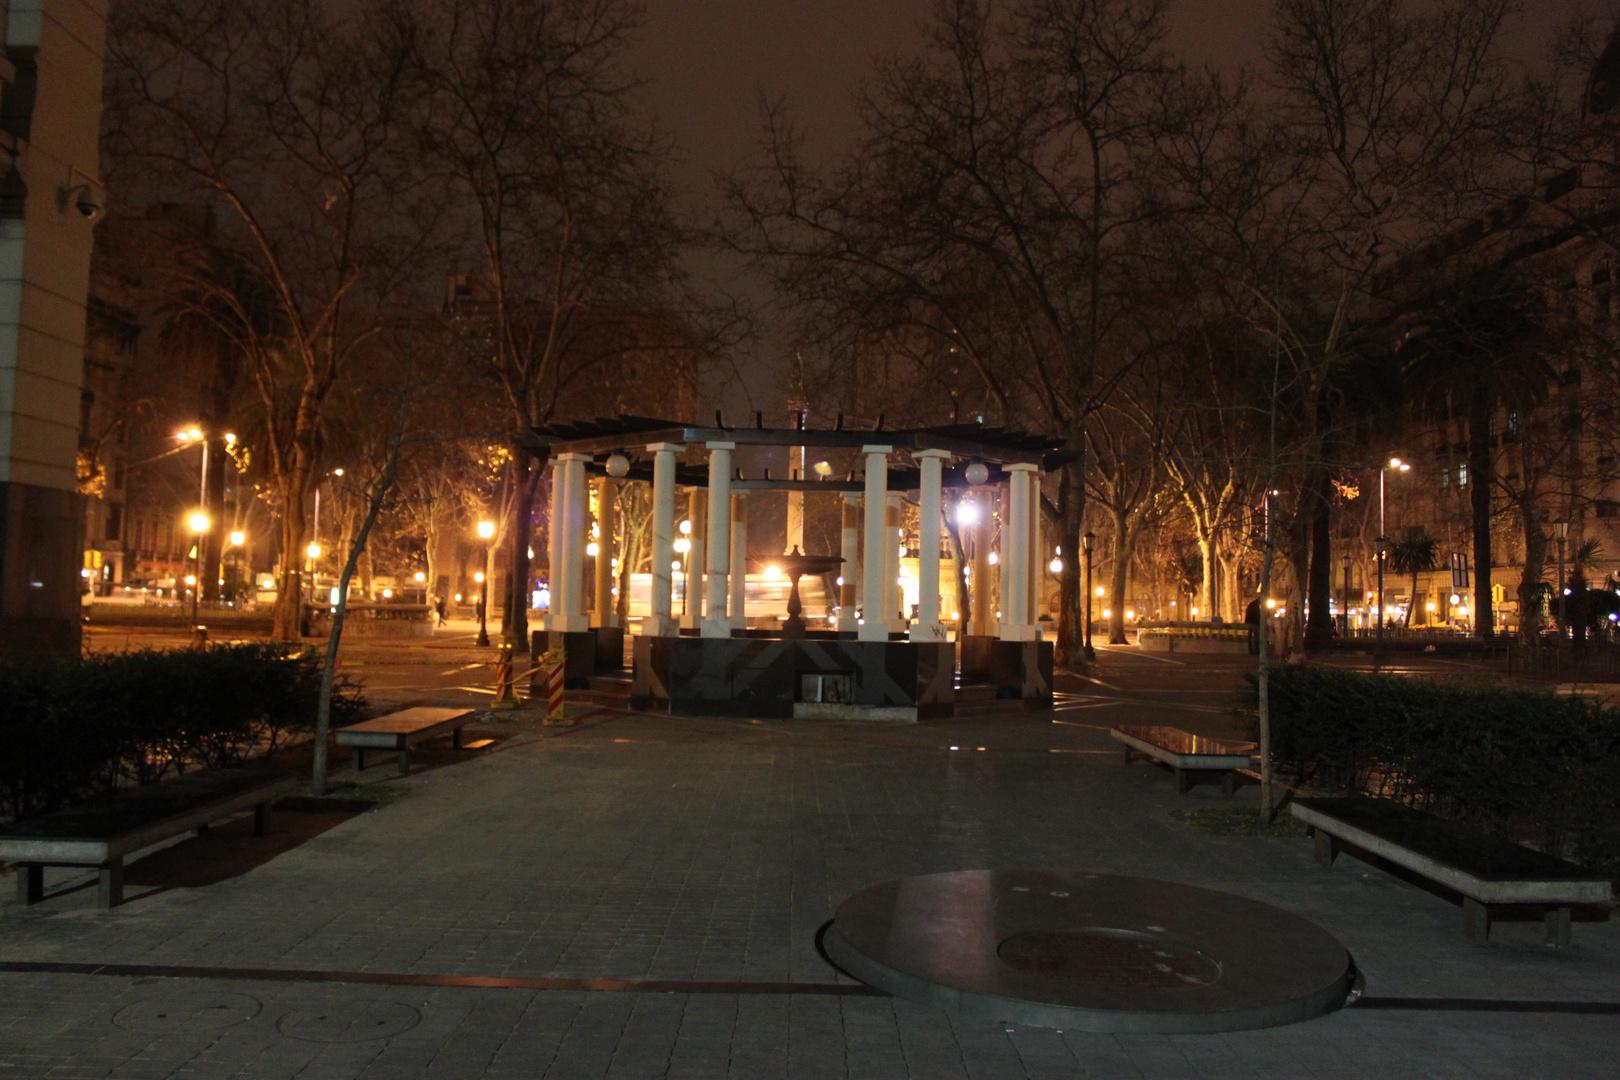 Montevideo - Plaza Cagancha/Plaza Libertad